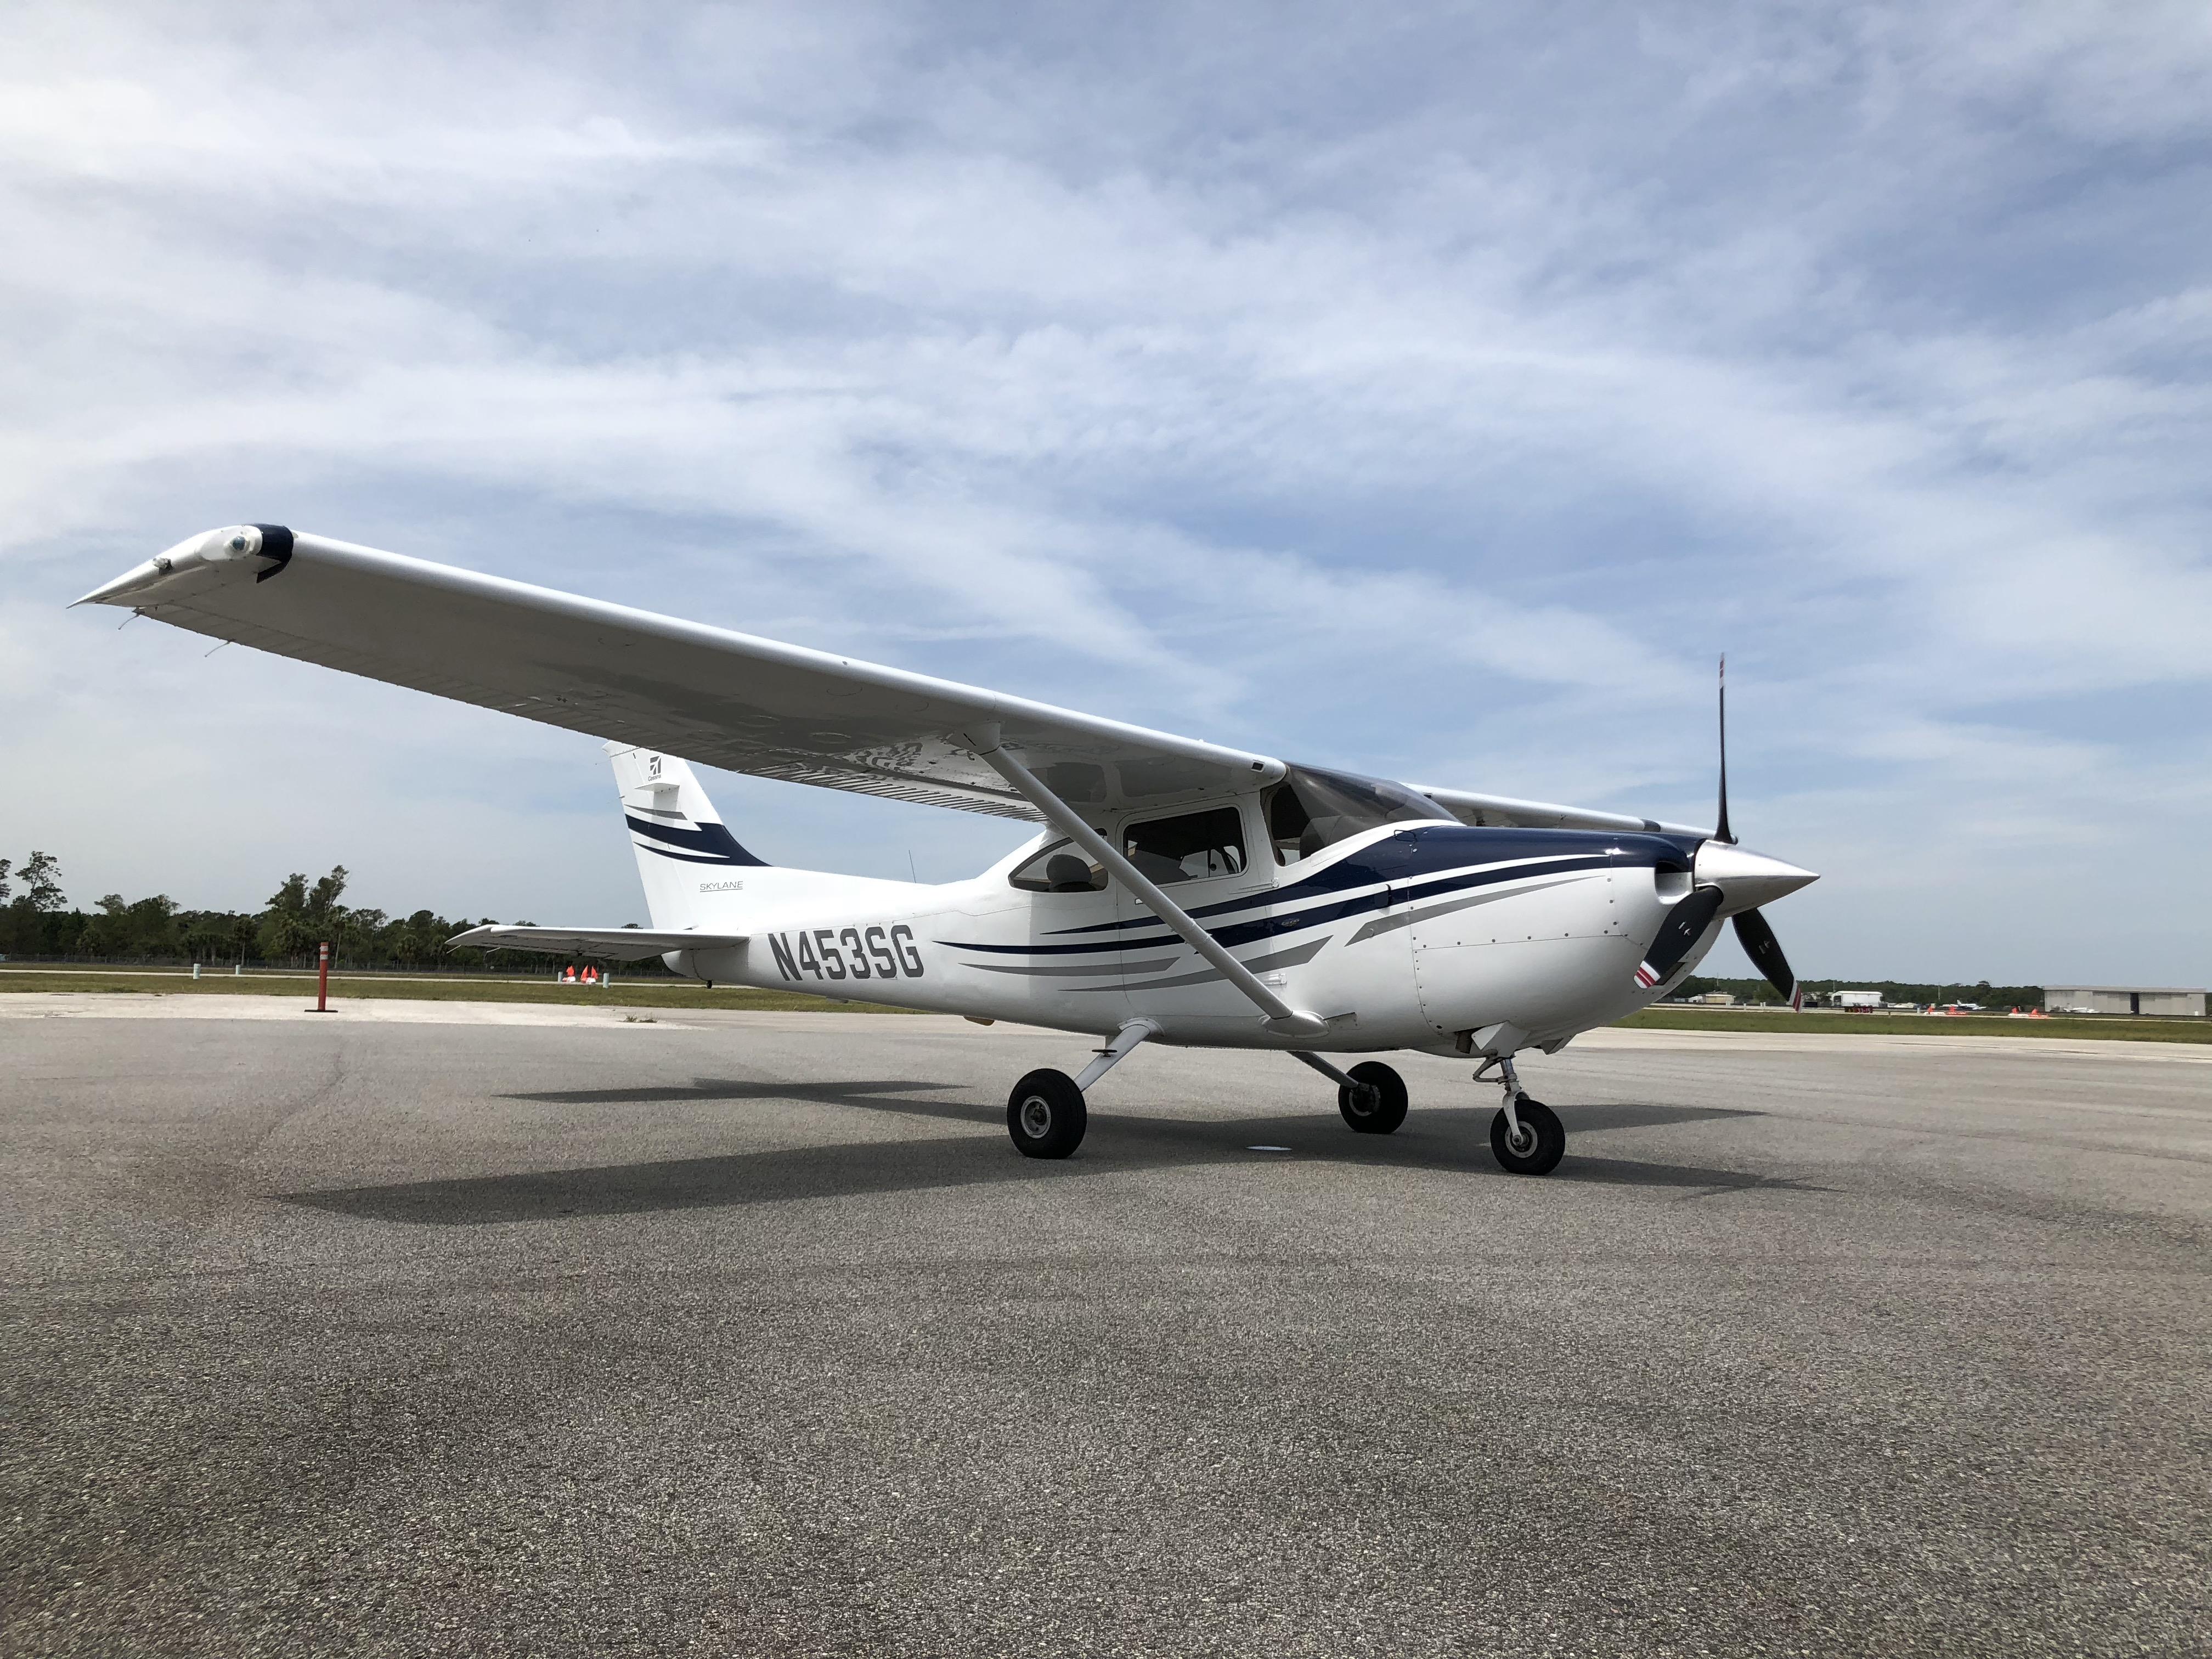 Cessna 182T Skylane Cockpit Poster with Garmin G1000 built-in Auto Pilot